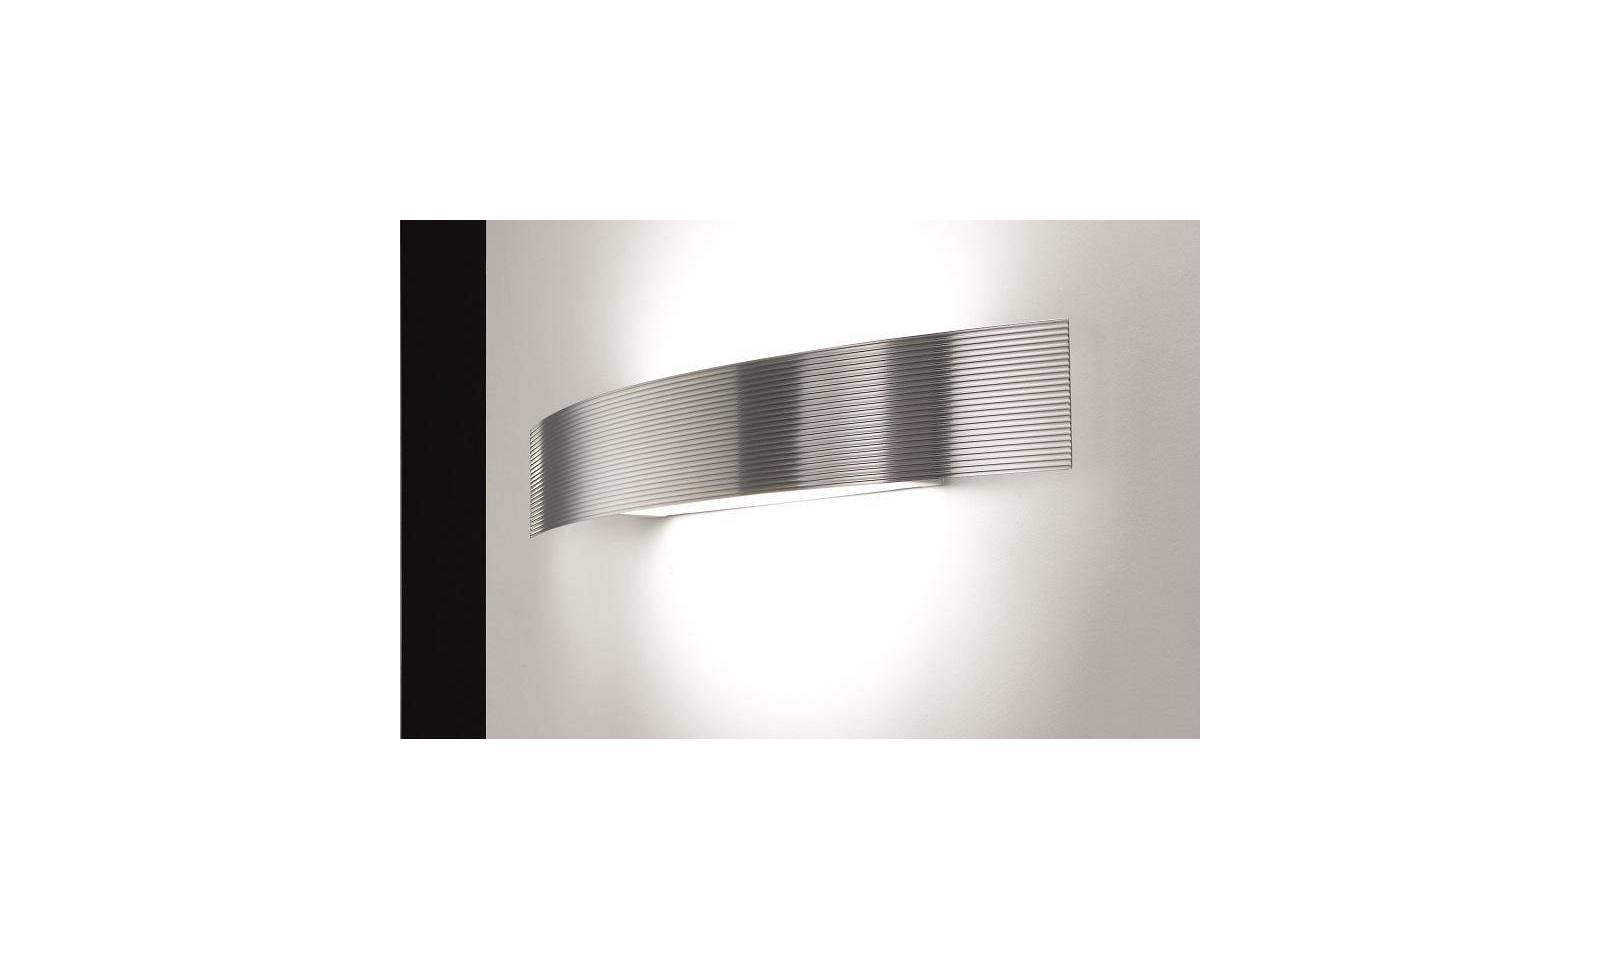 Lampade parete rame: appendiabiti da parete pin rame 10 cm by ...